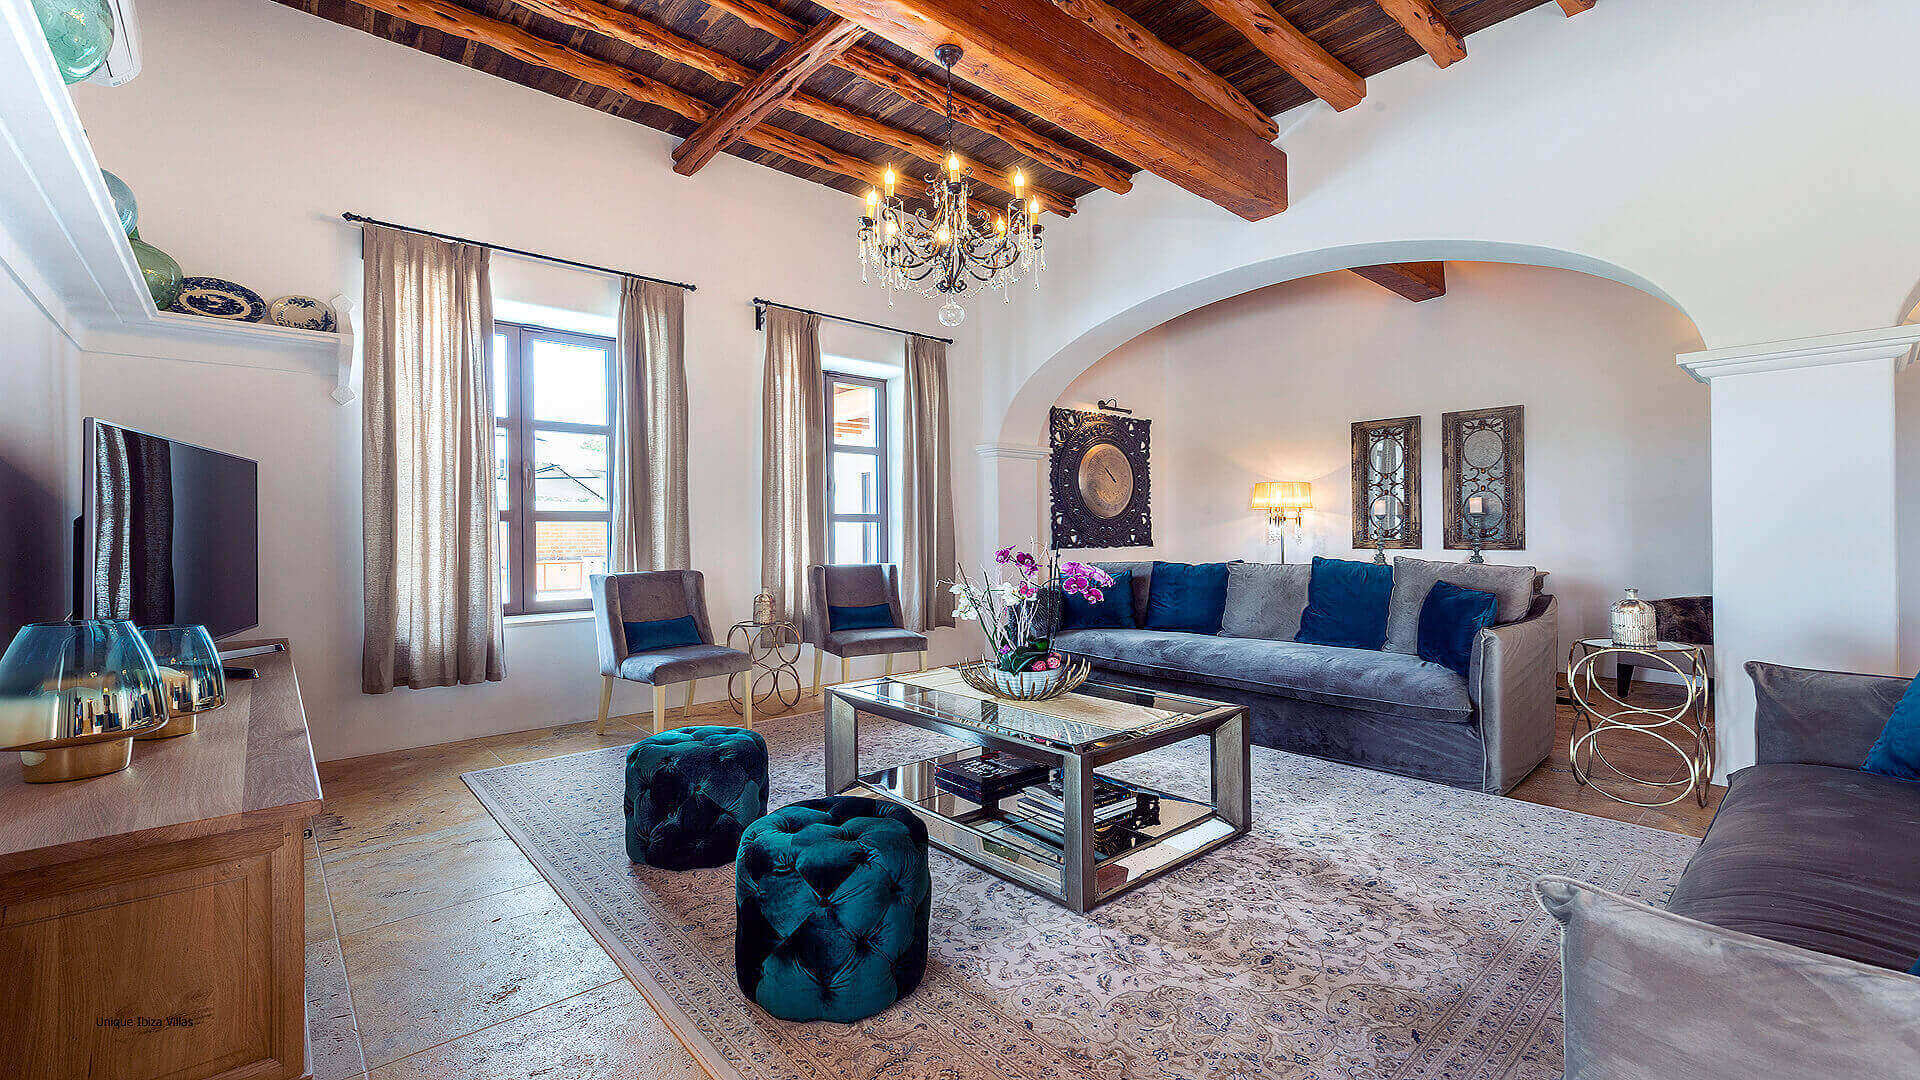 Casa Prats Ibiza 26 Santa Eulalia